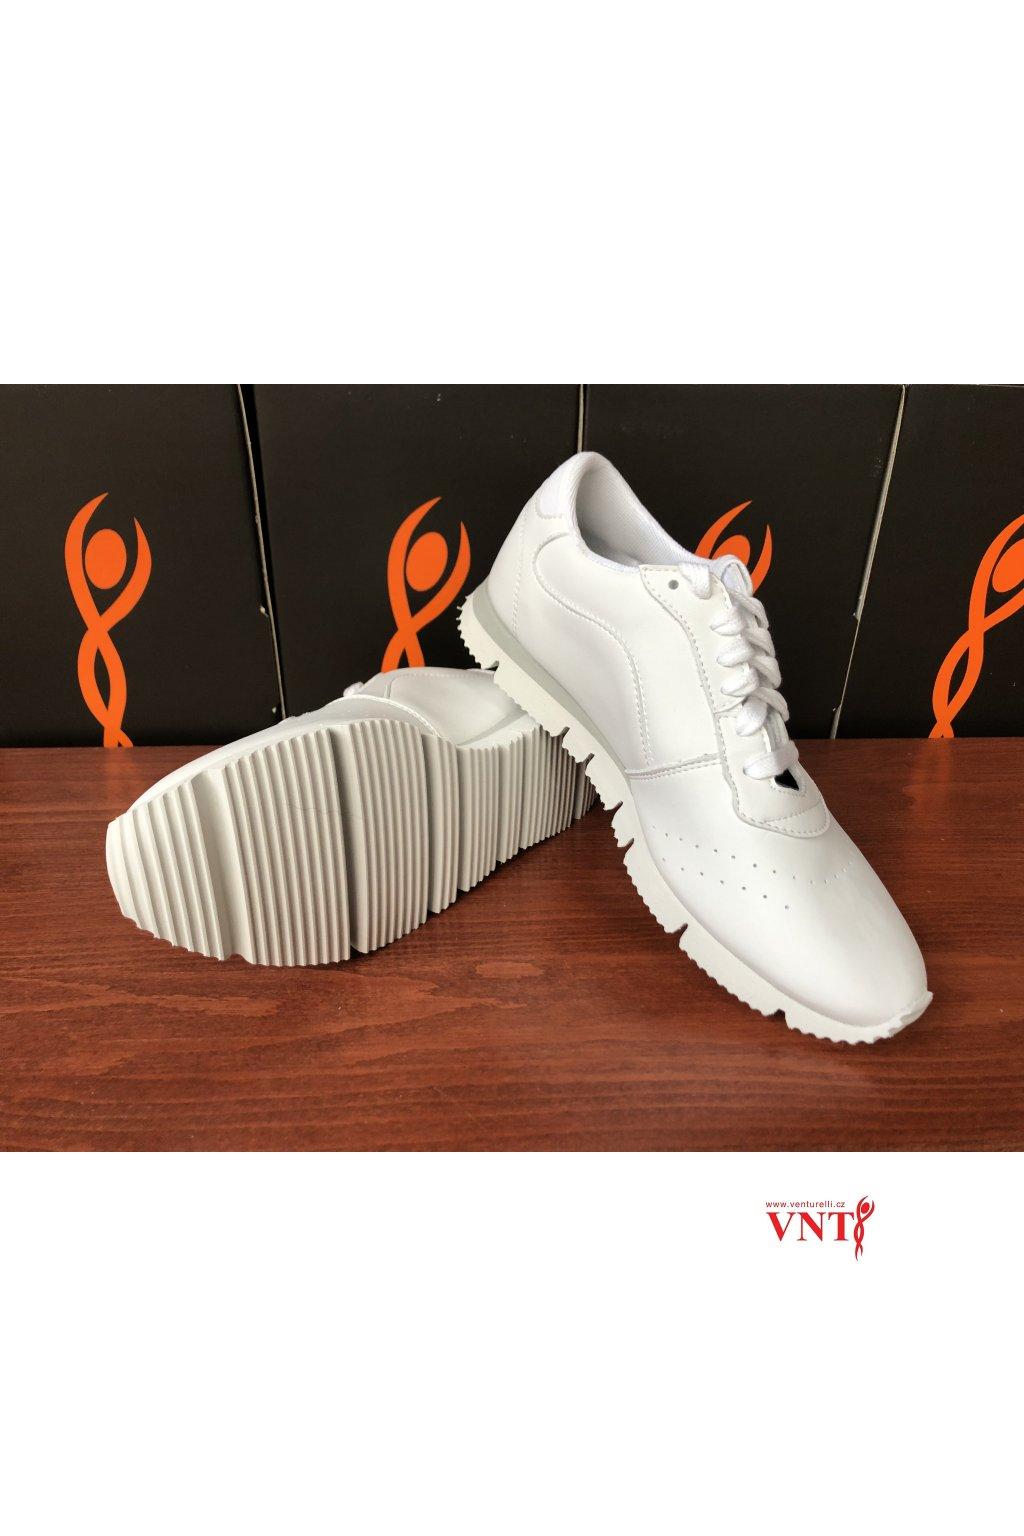 Tréninkové boty Venturelli AER-8 LINES